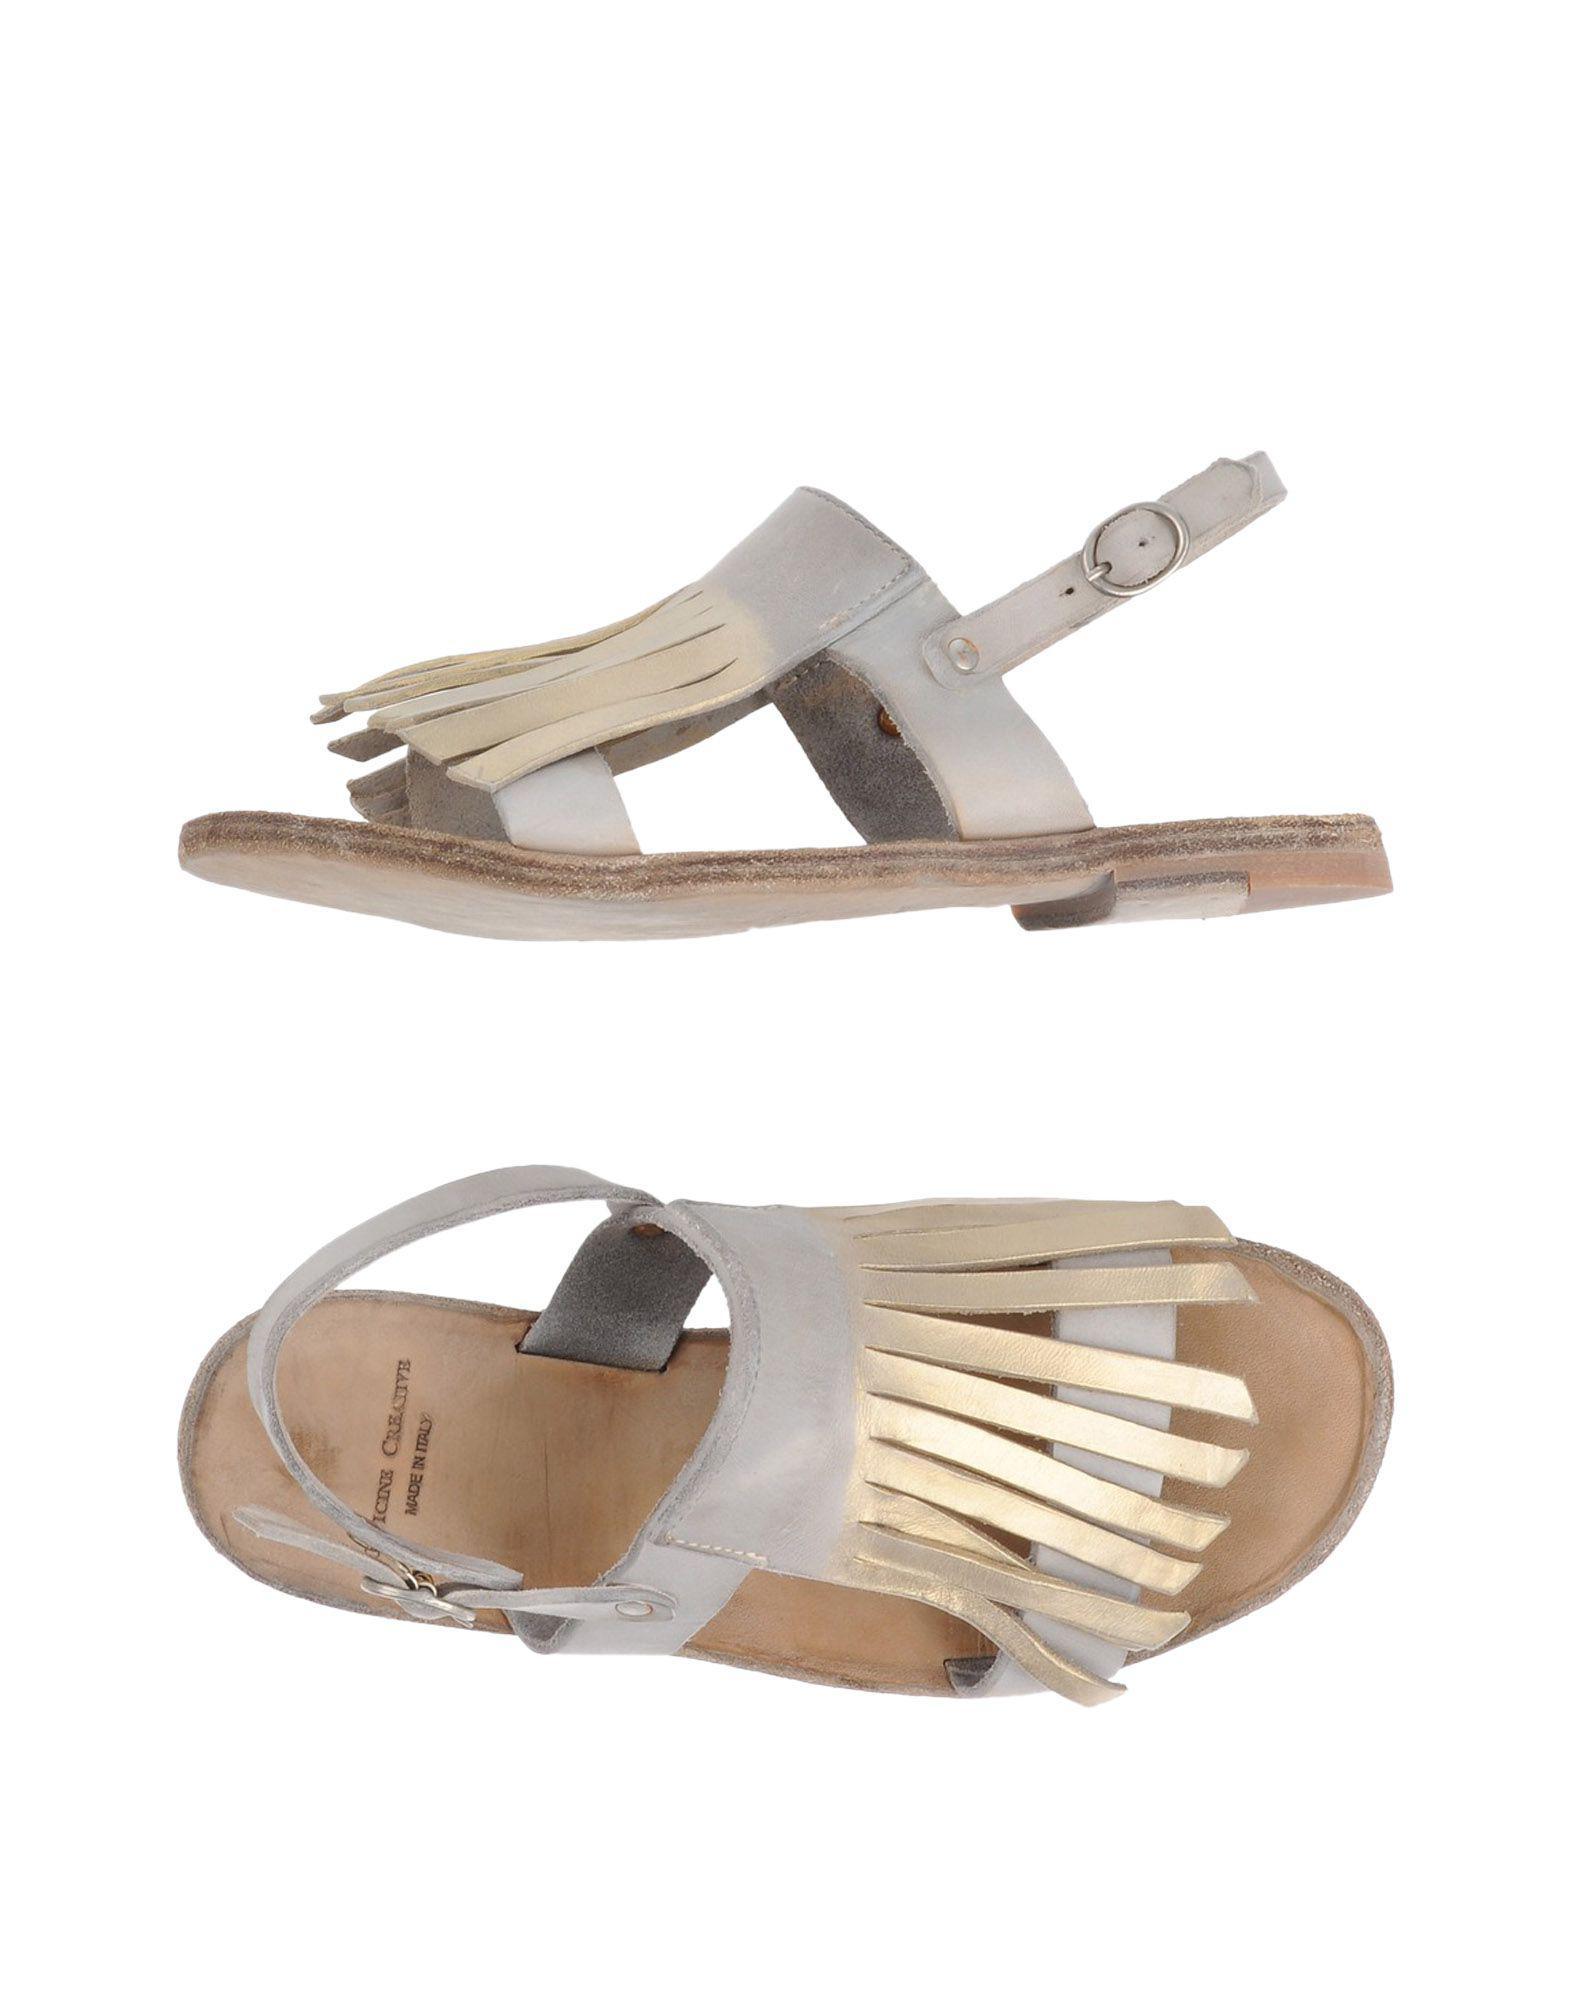 FOOTWEAR - Toe post sandals Officine Creative Italia p9OsWqk3F